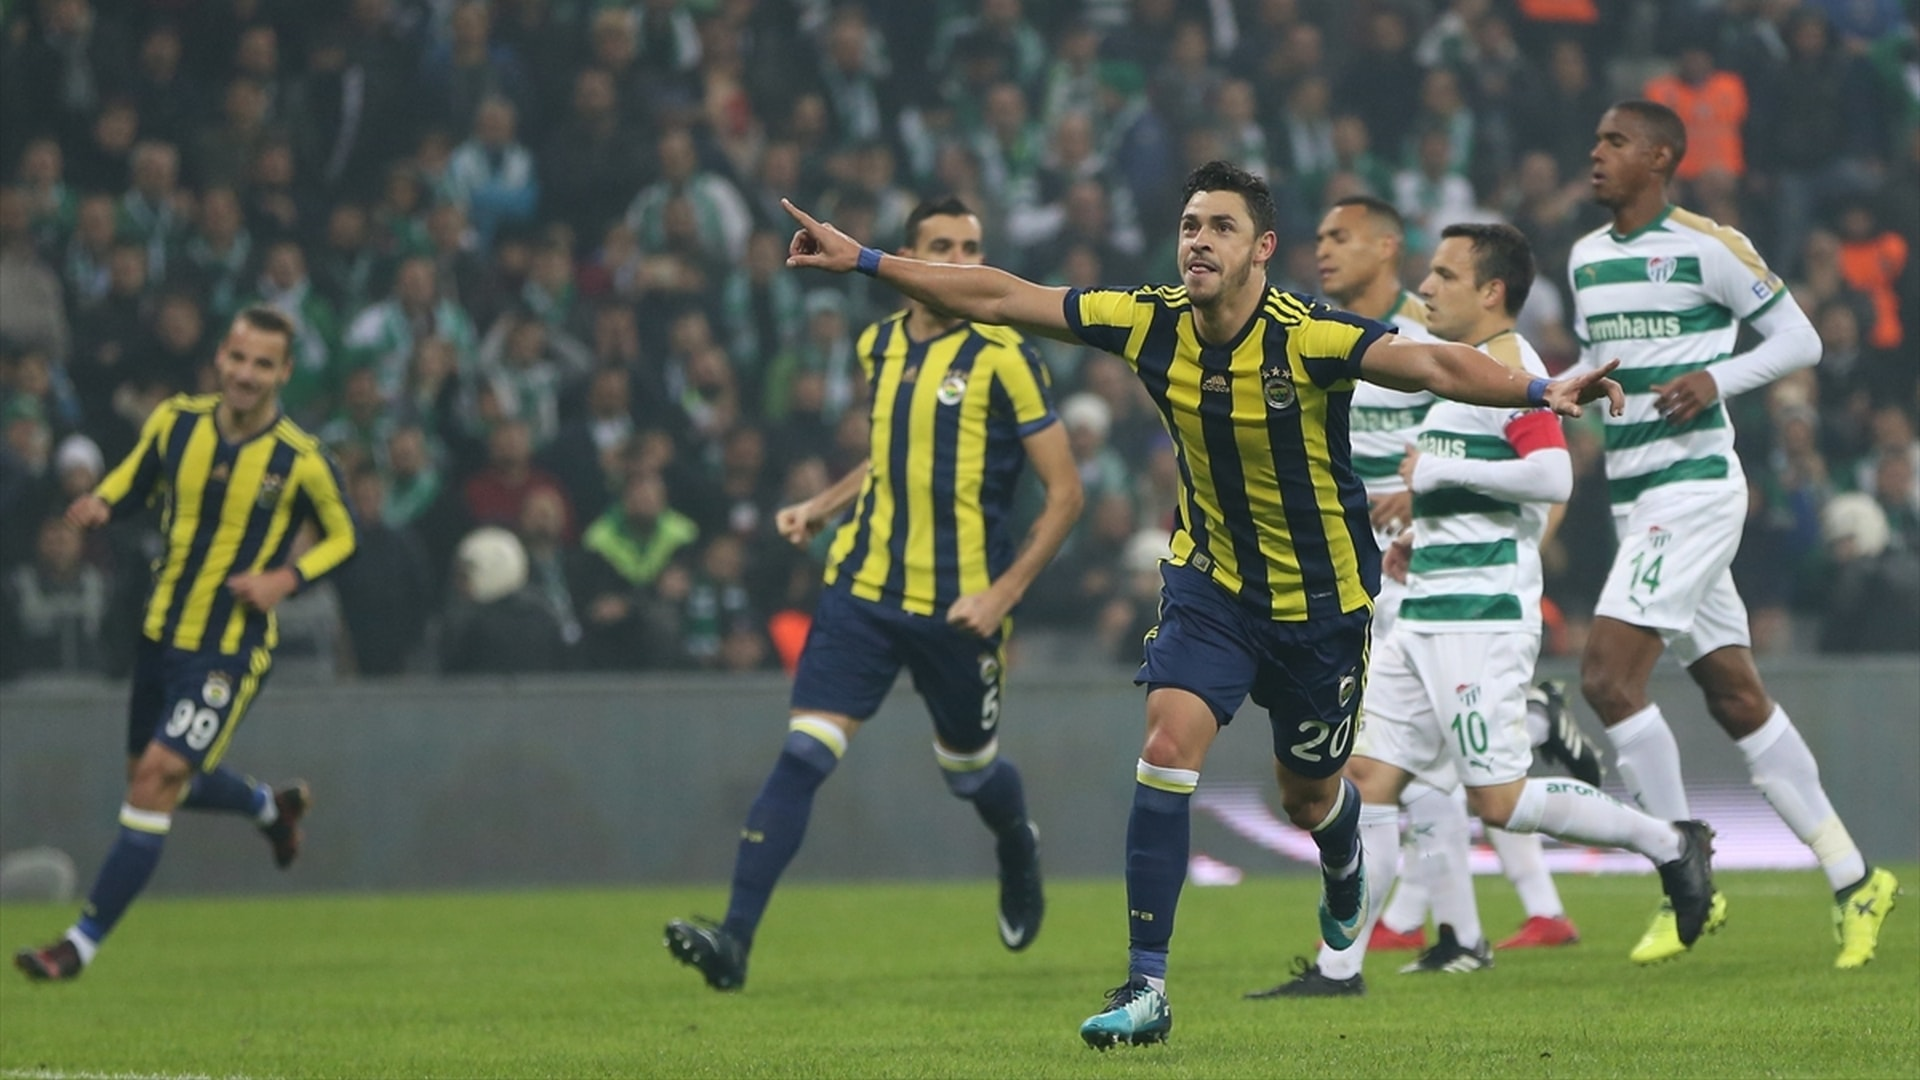 Bursaspor vs Fenerbahce Football Prediction